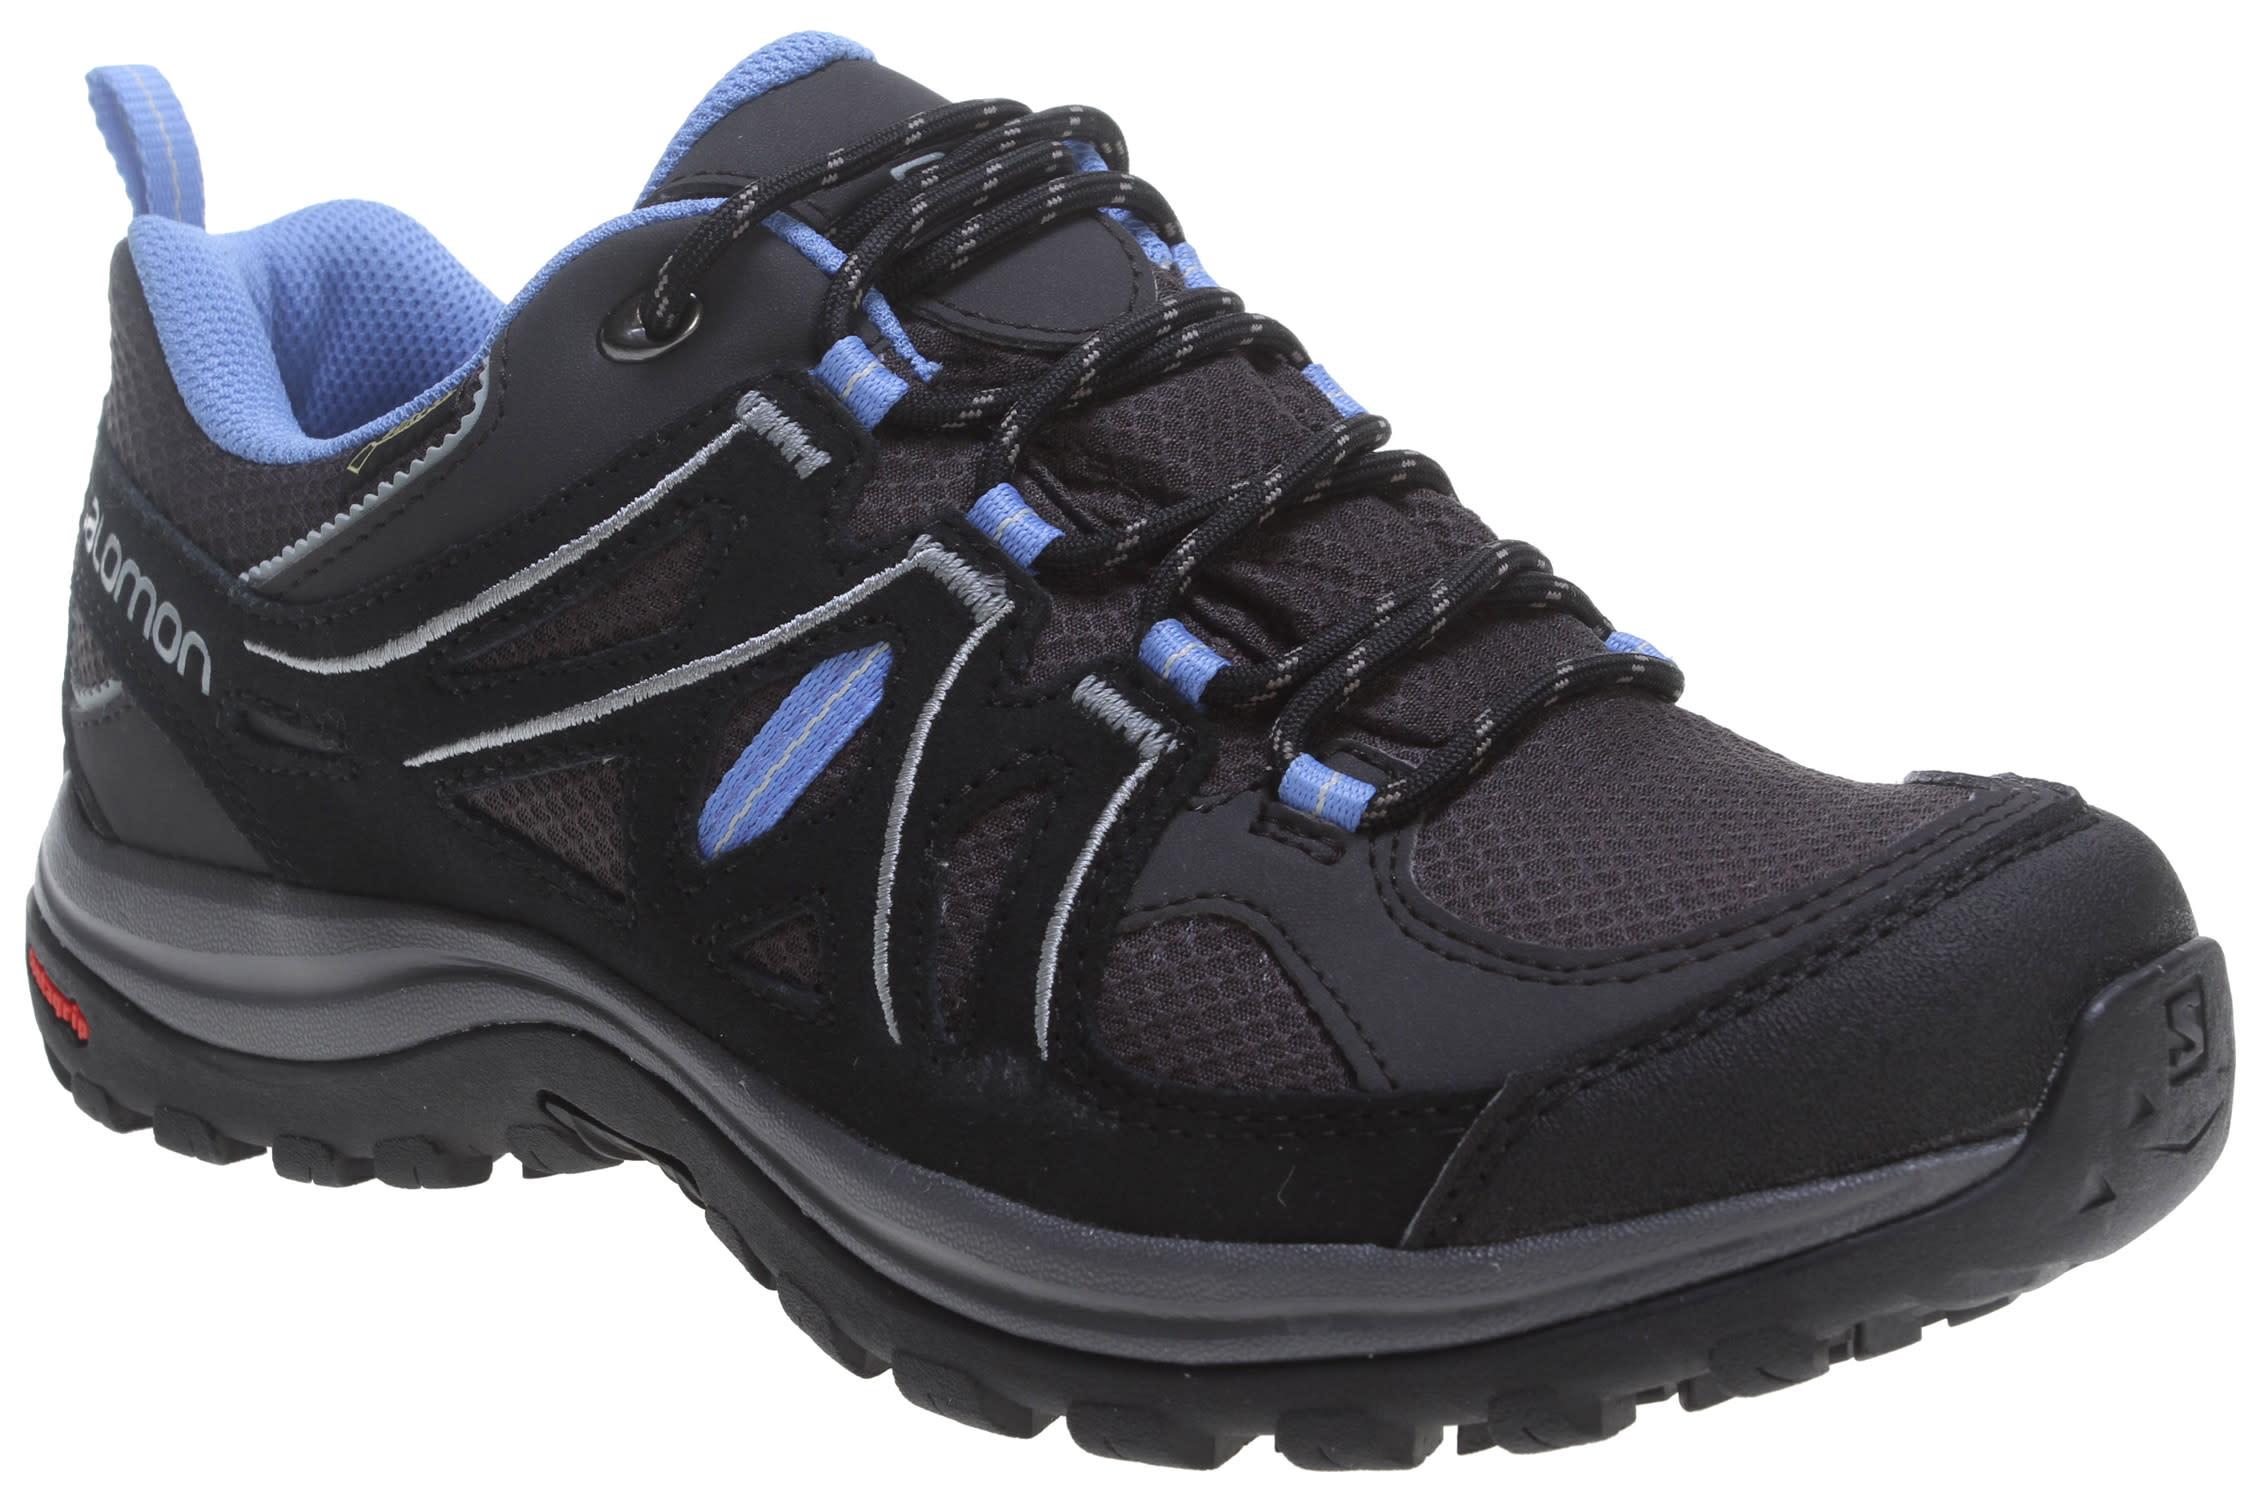 Yonex Power Cushion 35 Mens Badminton Shoes - Sweatband.com